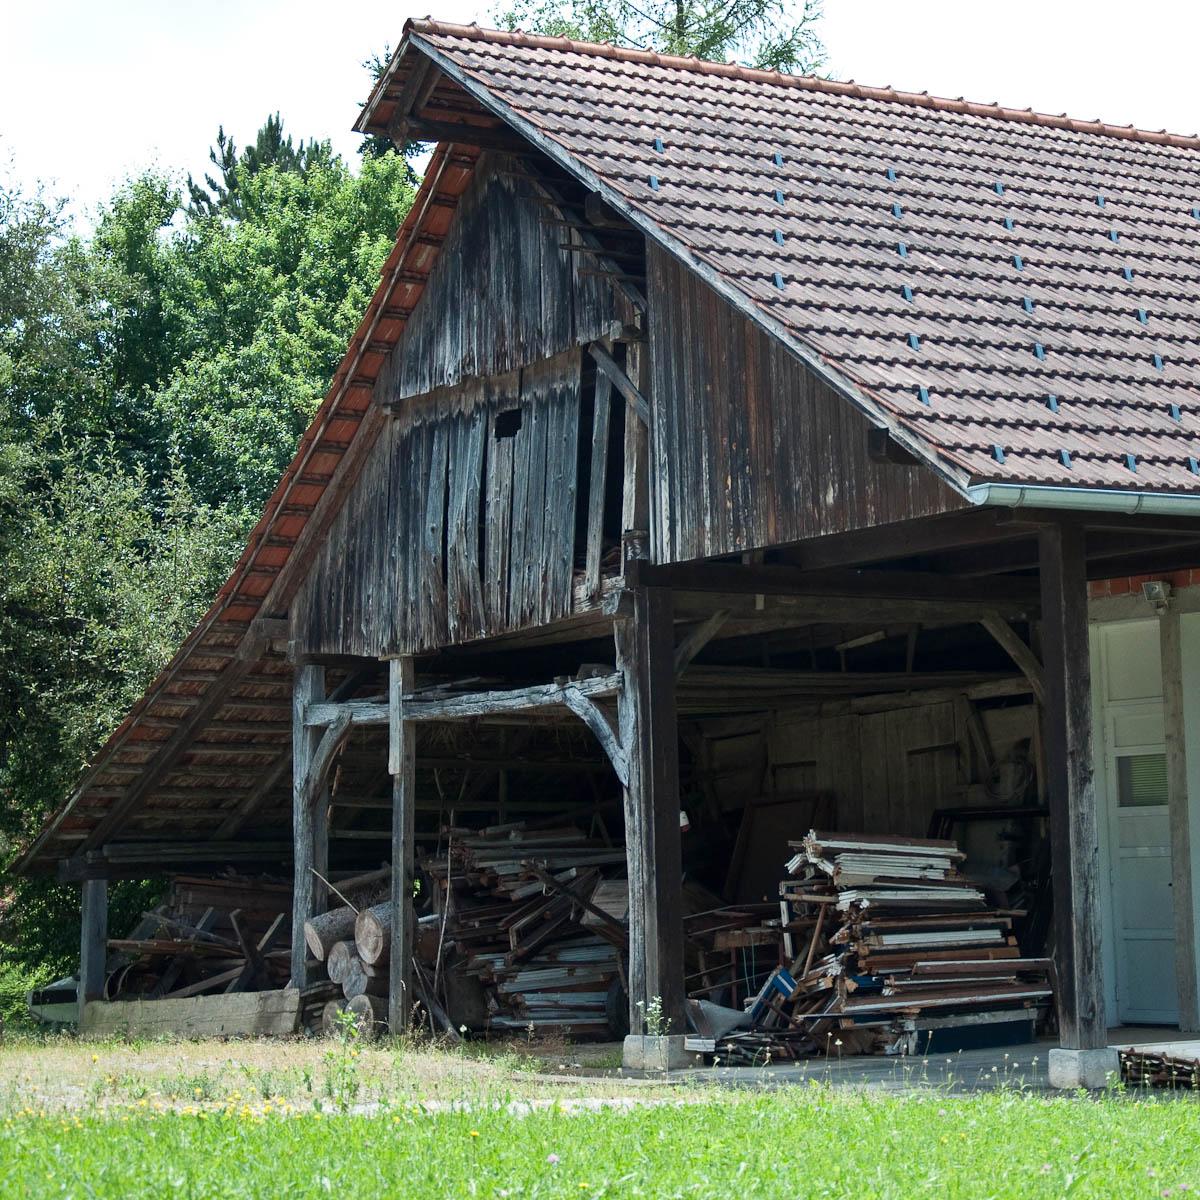 Slovenia's Traditional Hayrack Barns